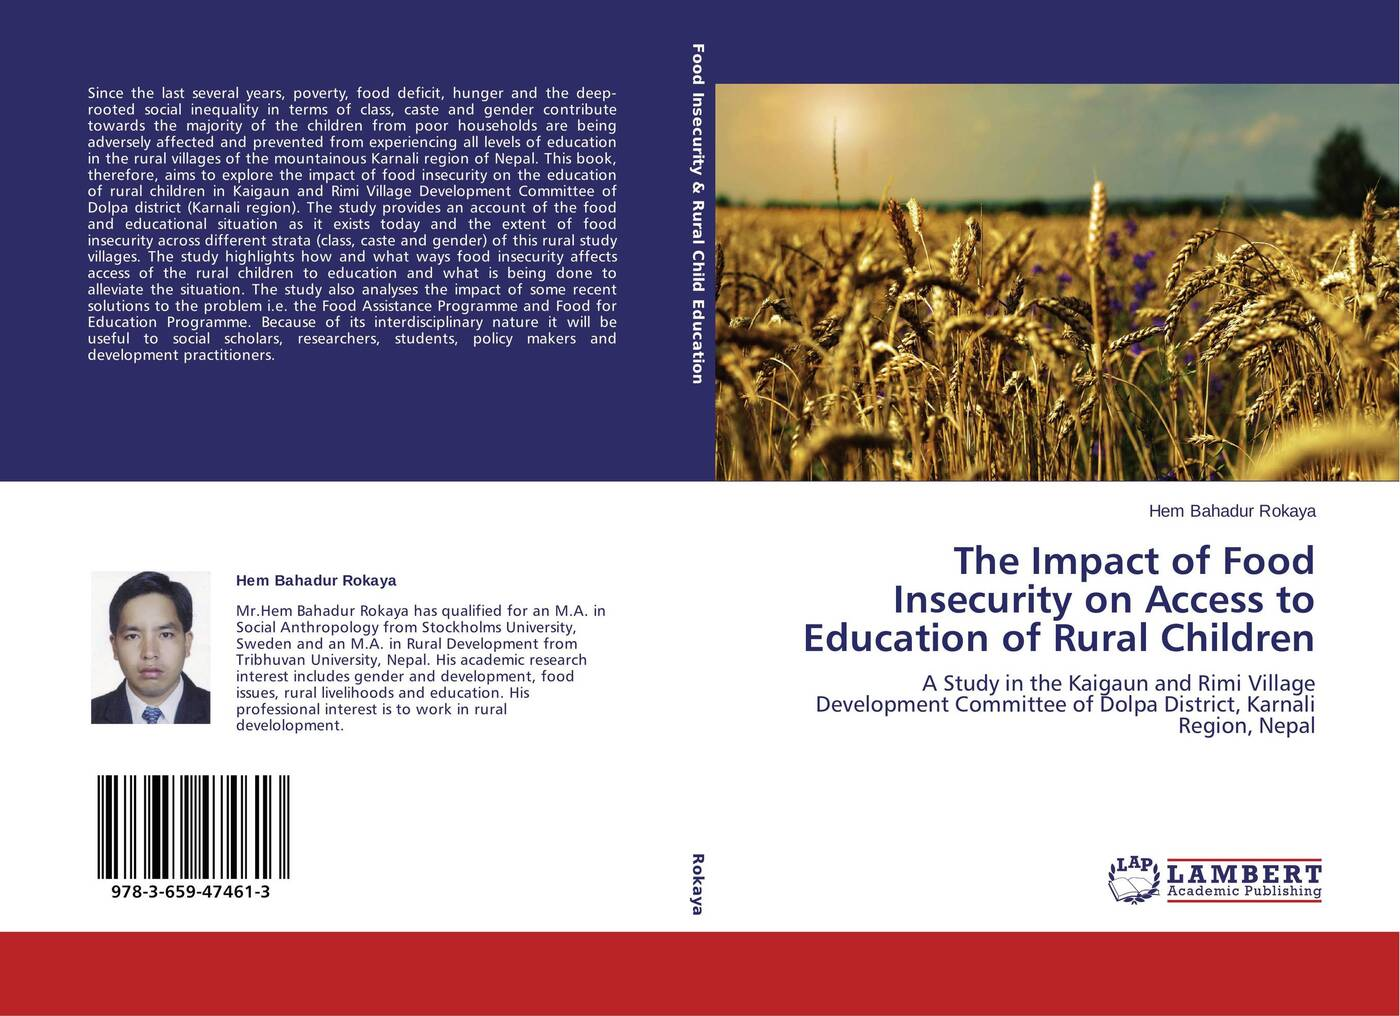 Hem Bahadur Rokaya The Impact of Food Insecurity on Access to Education of Rural Children цена в Москве и Питере